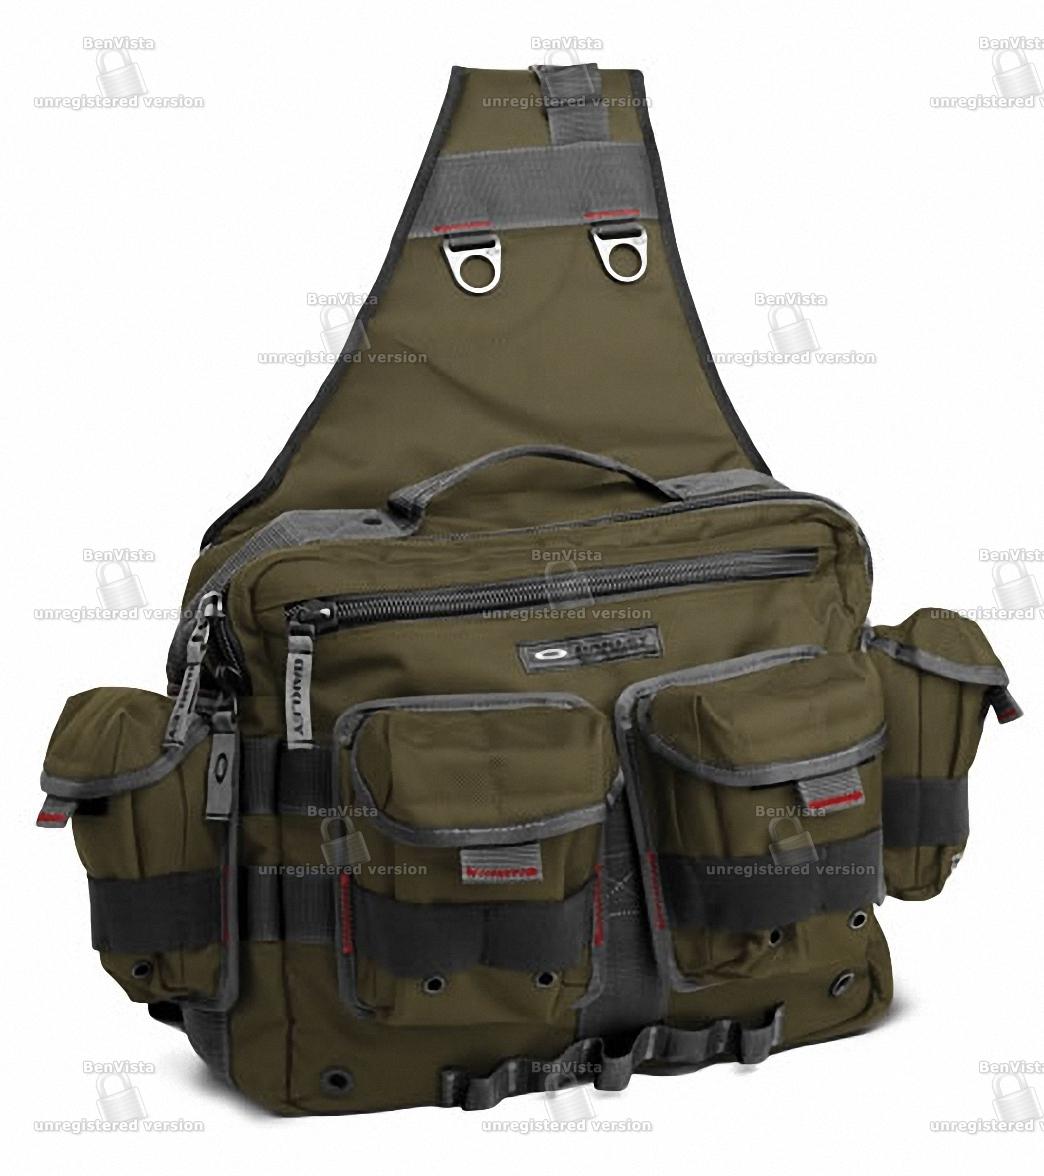 Oakley AP Sandbag at SwimOutlet.com - Free Shipping 11a58995cd875